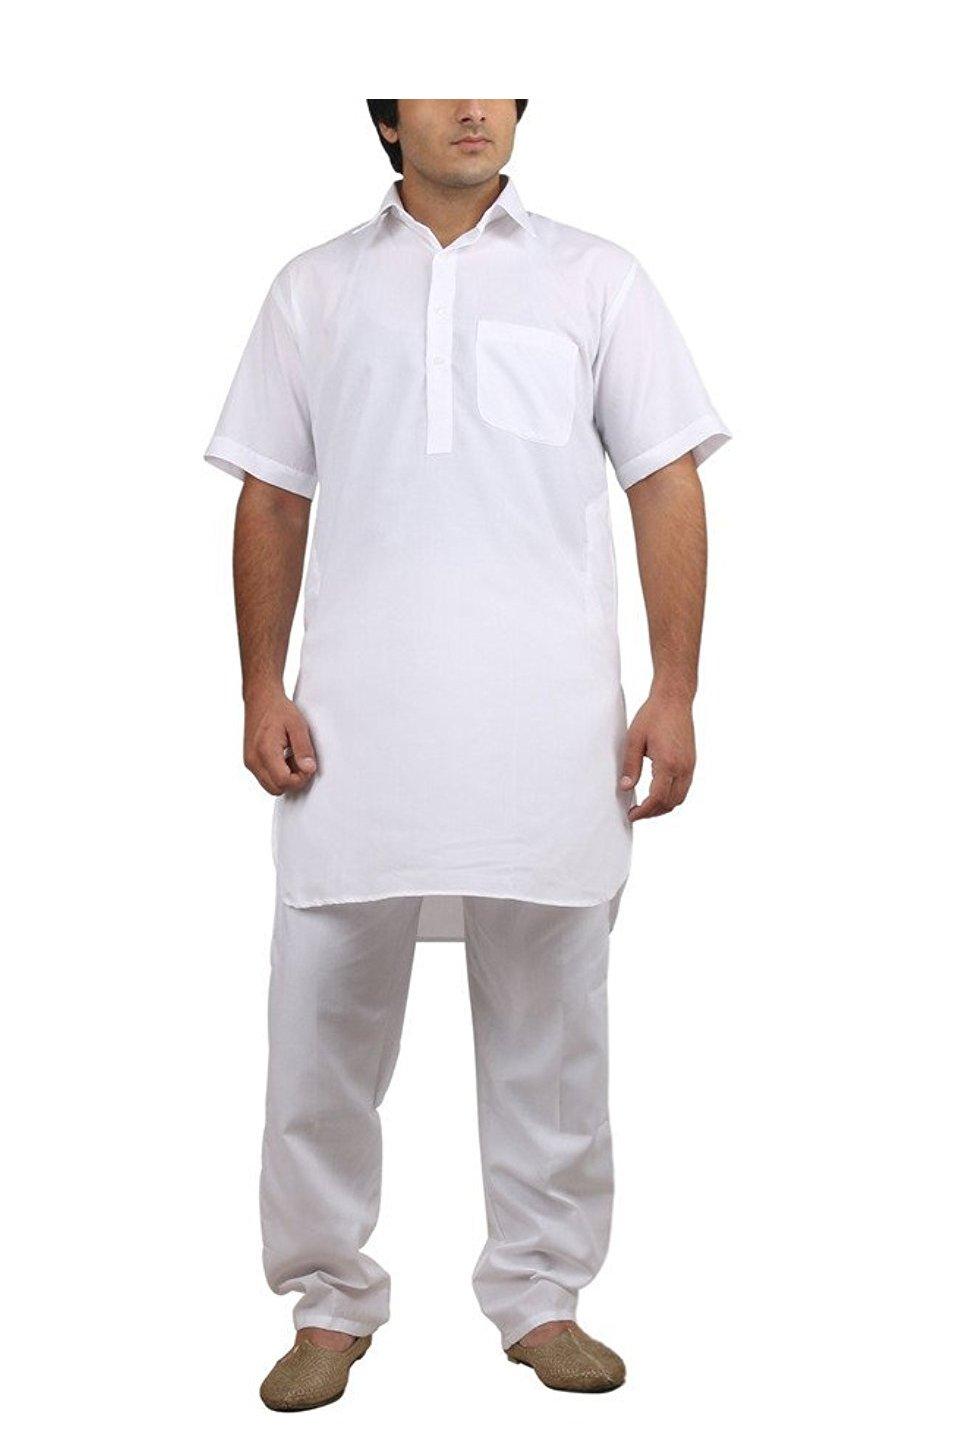 Royal Kurta Big Boy's Cotton Blended Fine Pathani Kurta Pyjama 42 White